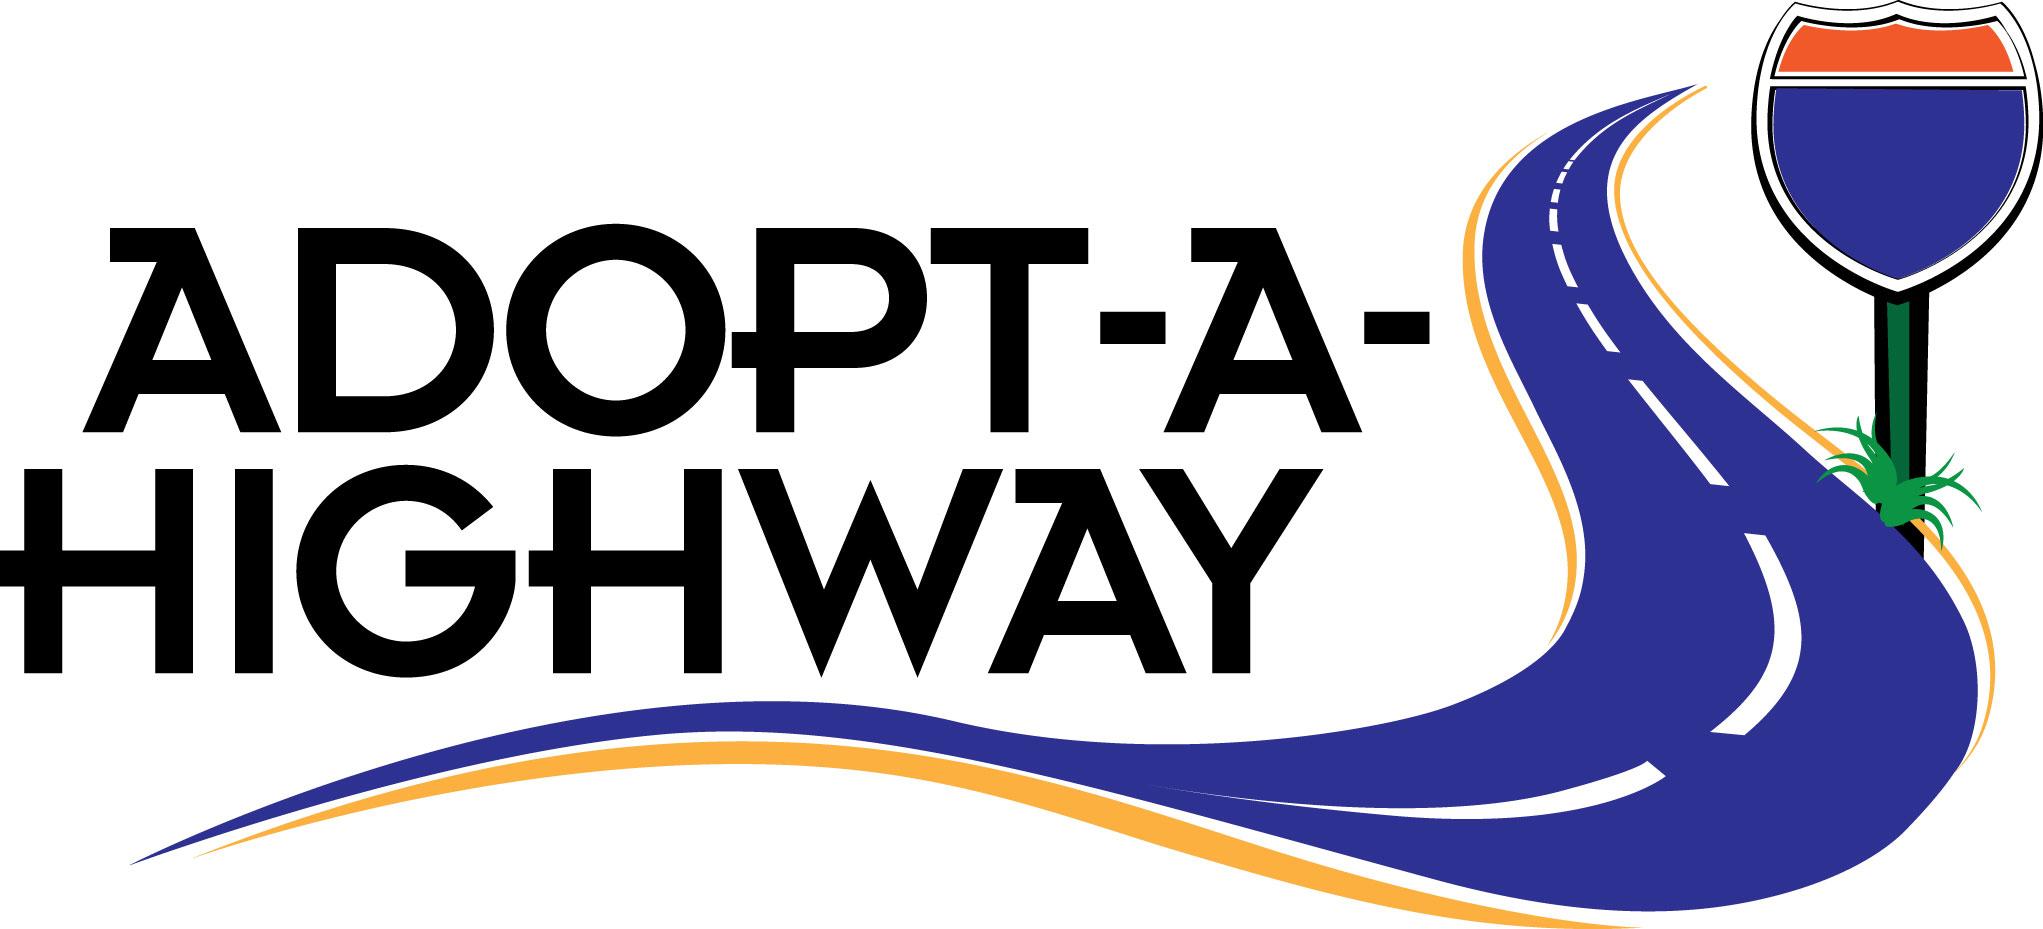 Highway clipart logo Clean Jewish Mitzvah up Mitzvah